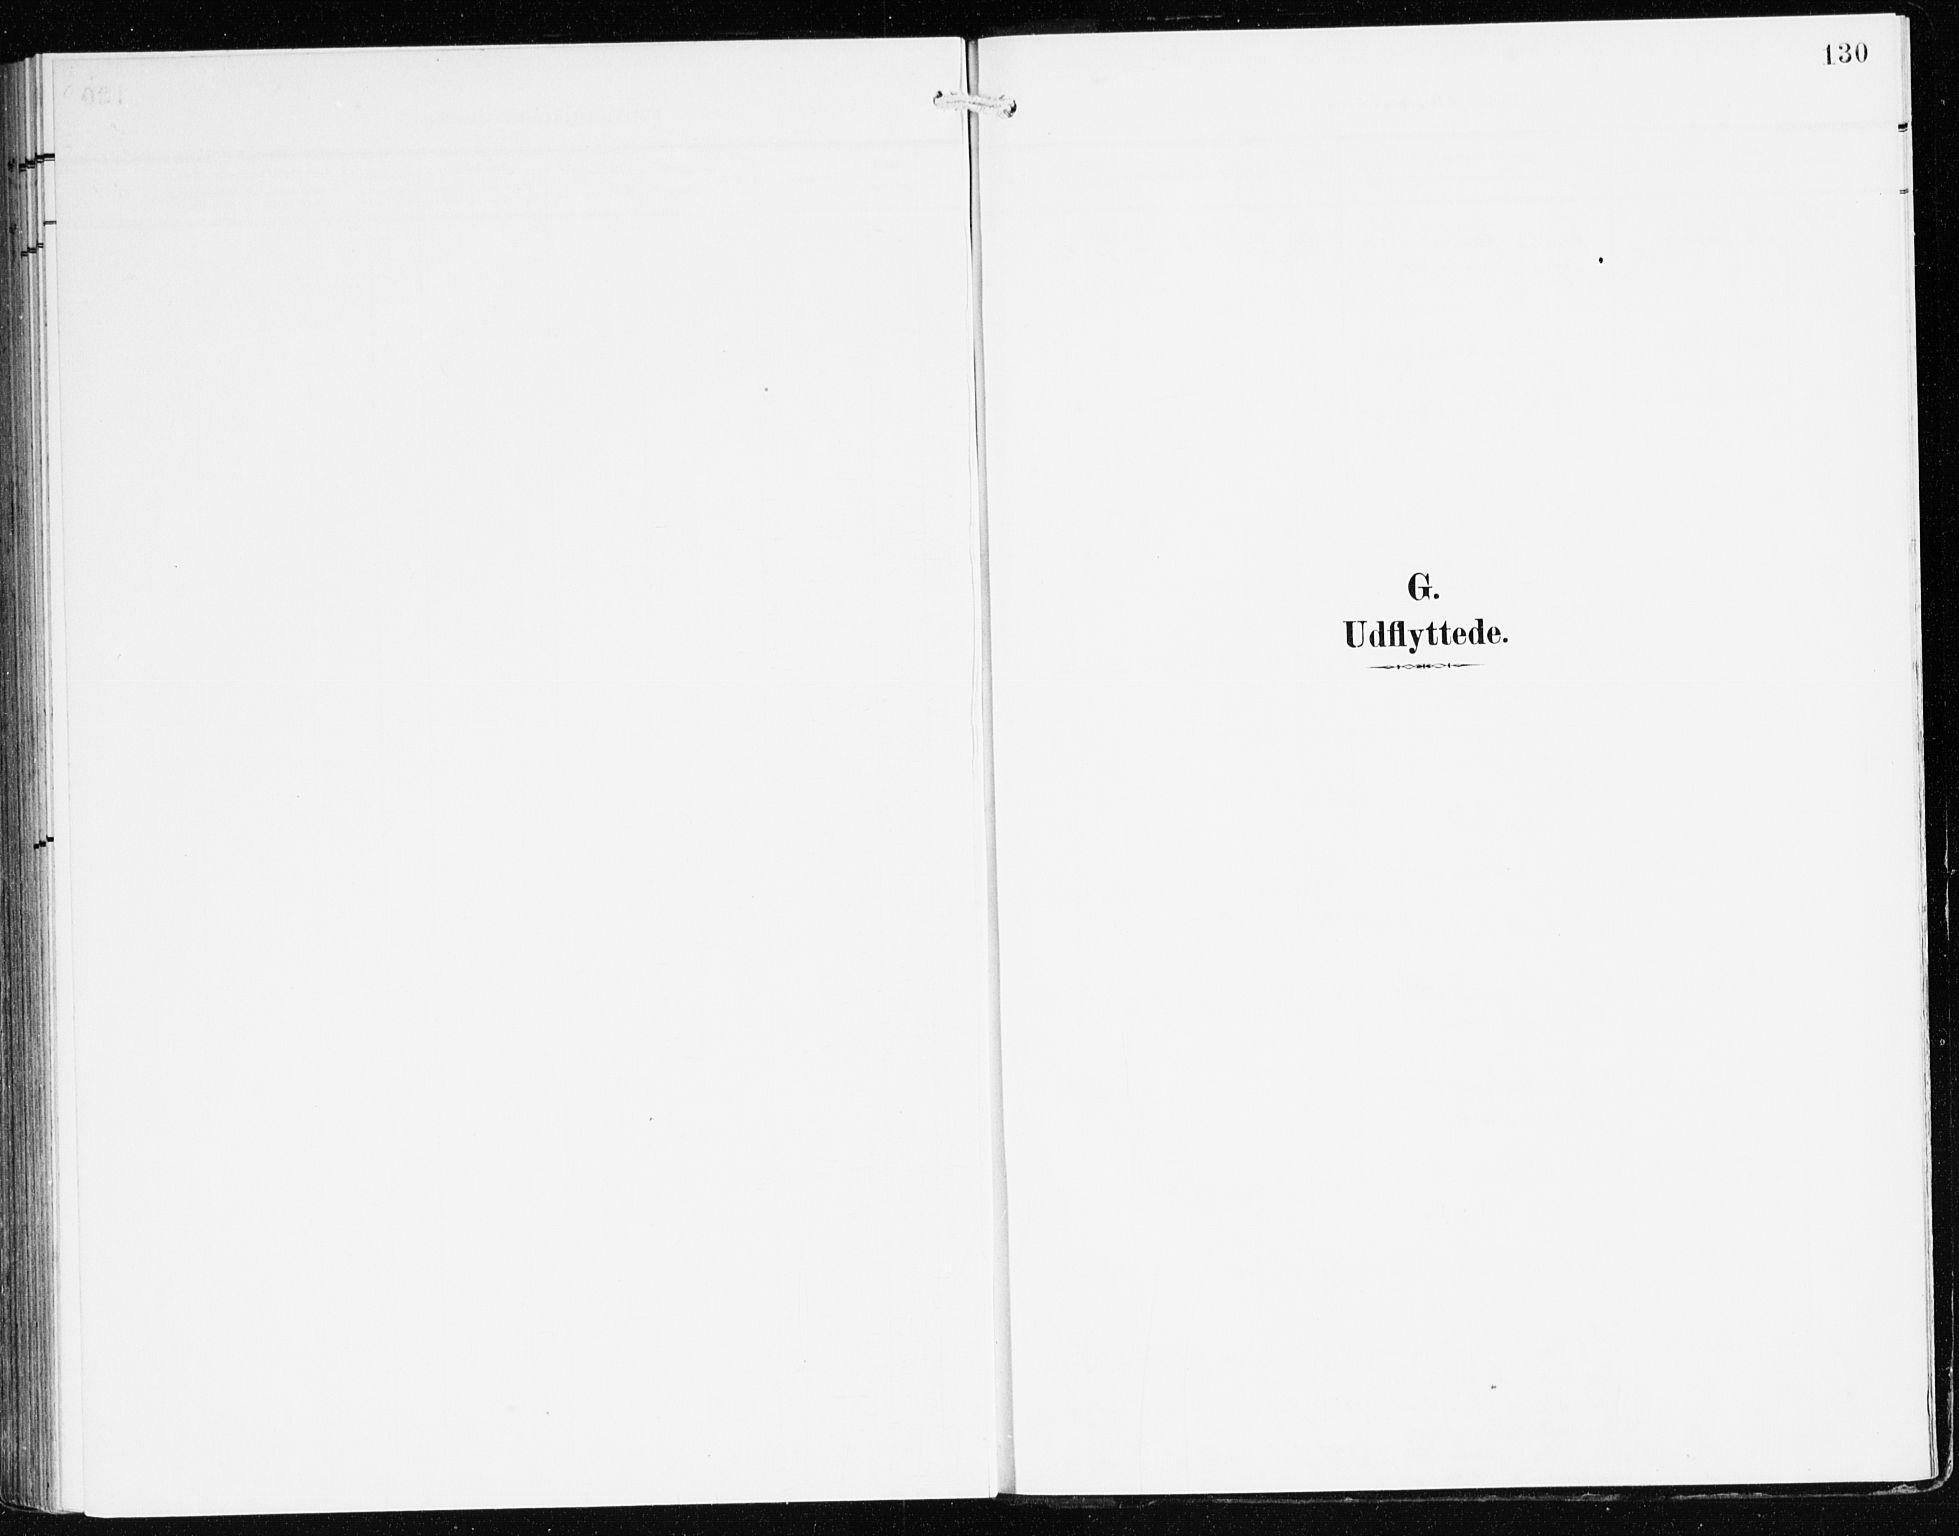 SAB, Bremanger Sokneprestembete, H/Haa: Parish register (official) no. C 1, 1908-1921, p. 130